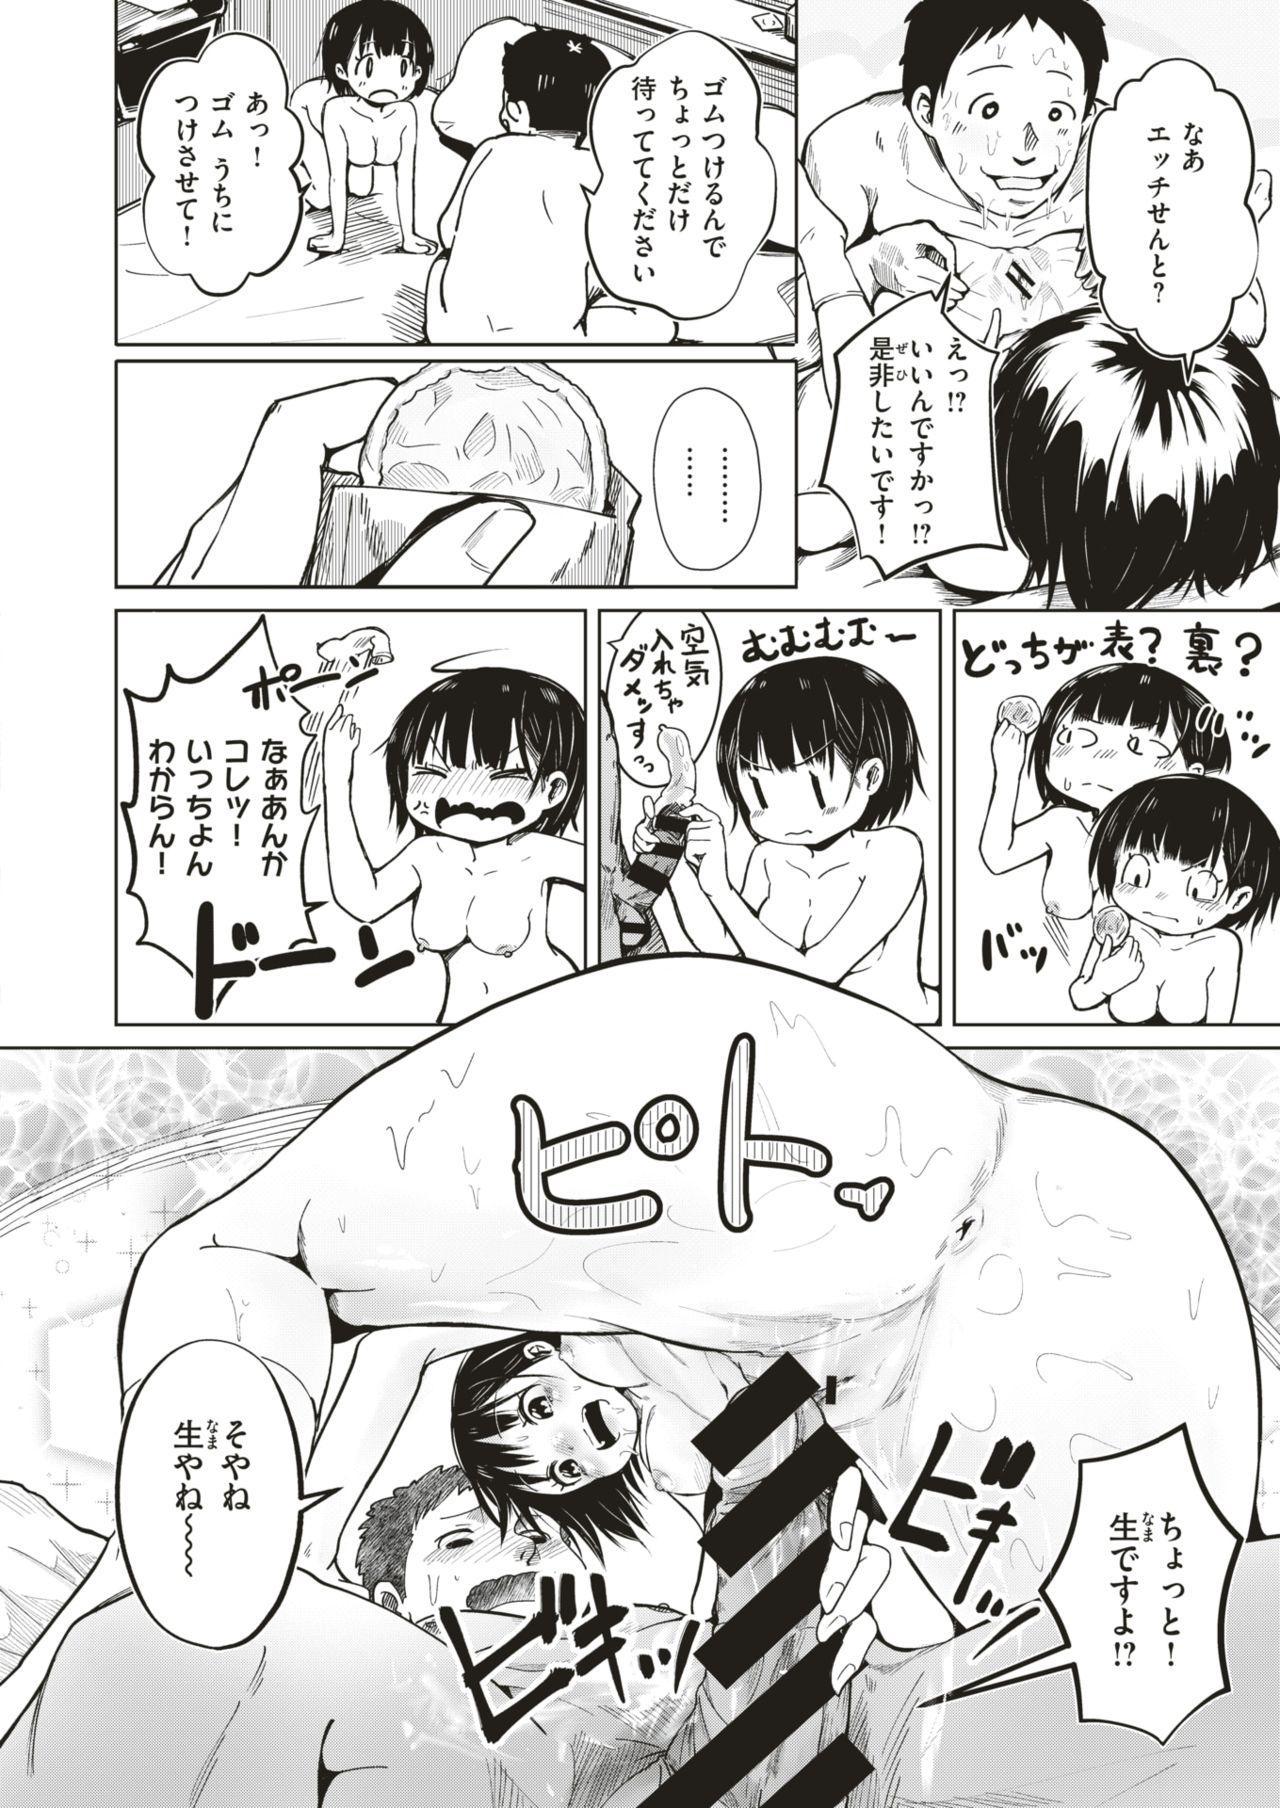 COMIC HAPPINING Vol. 4 118